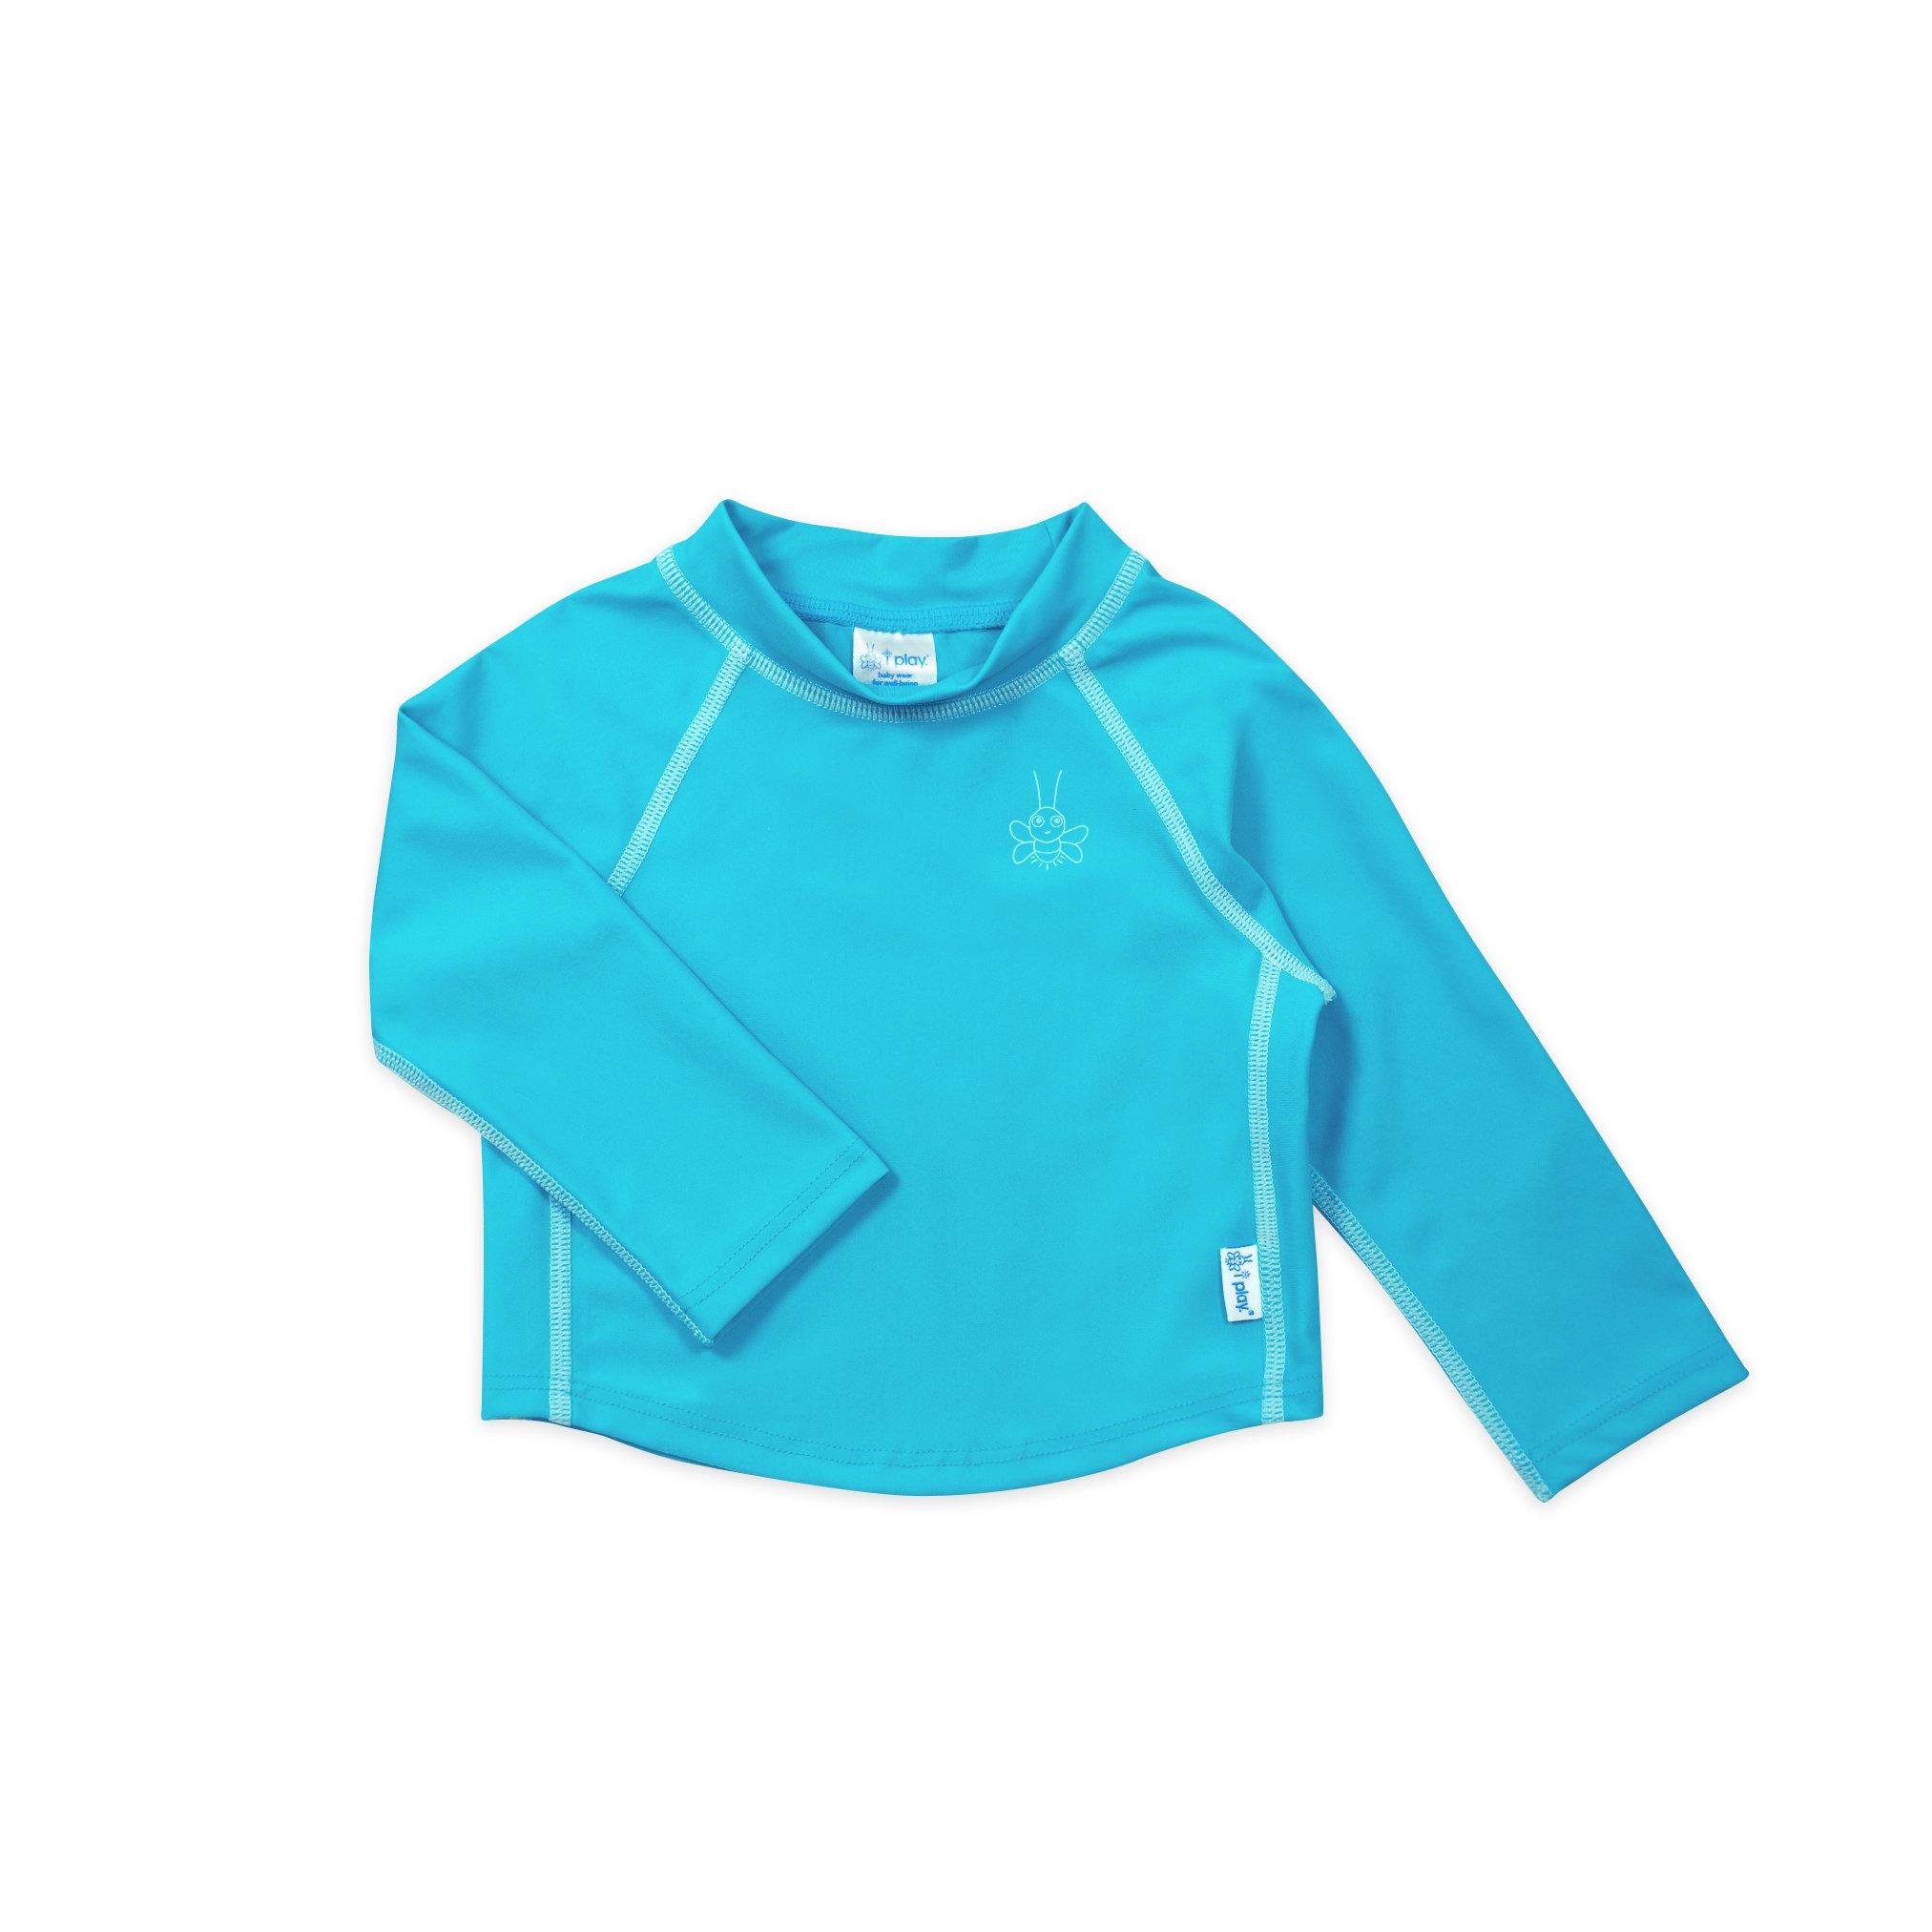 i play. Long Sleeve Rashguard Shirt | All-day UPF